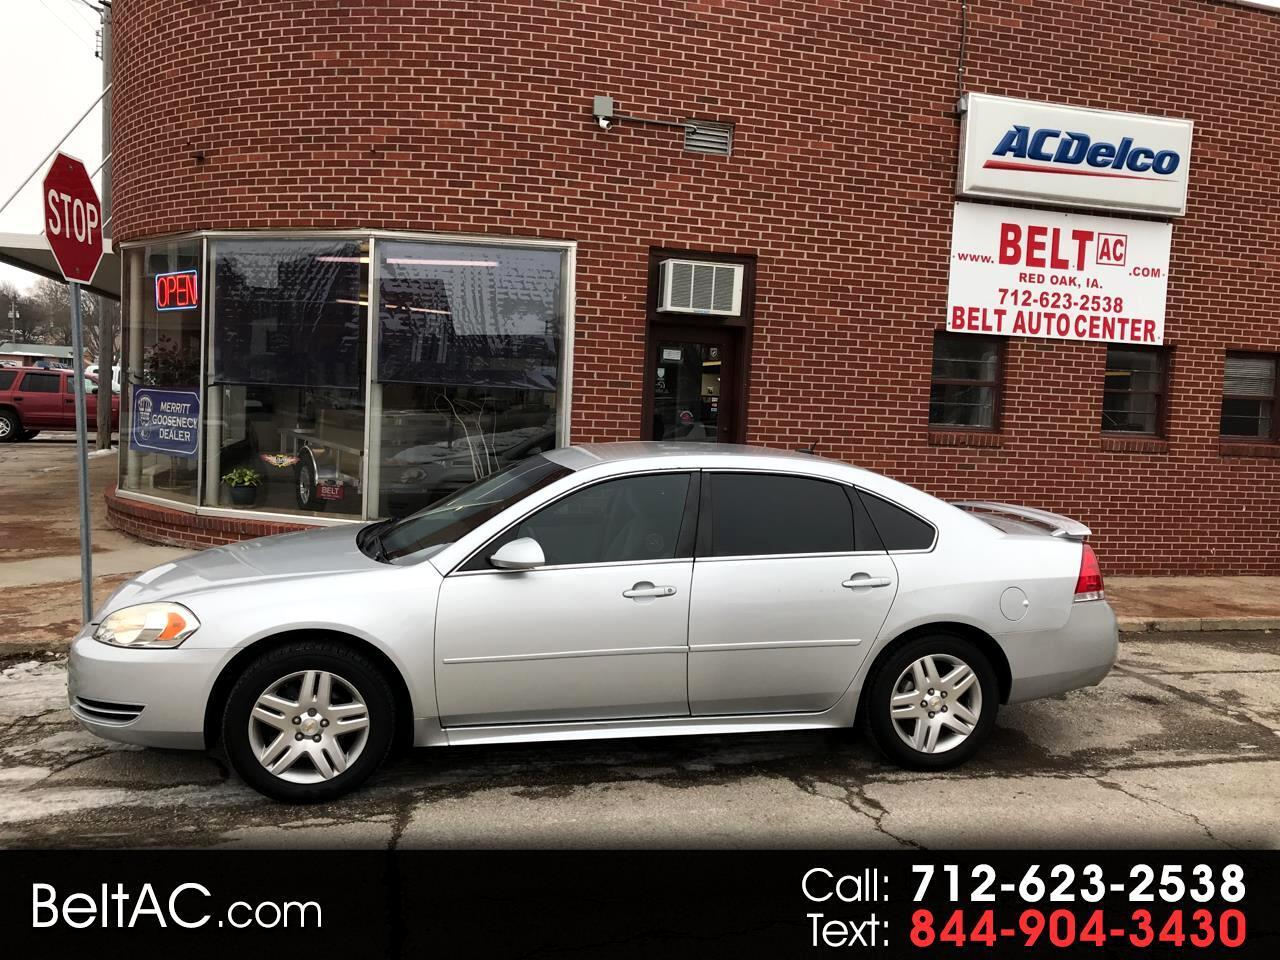 Chevrolet Impala 4dr Sdn LT Retail 2012